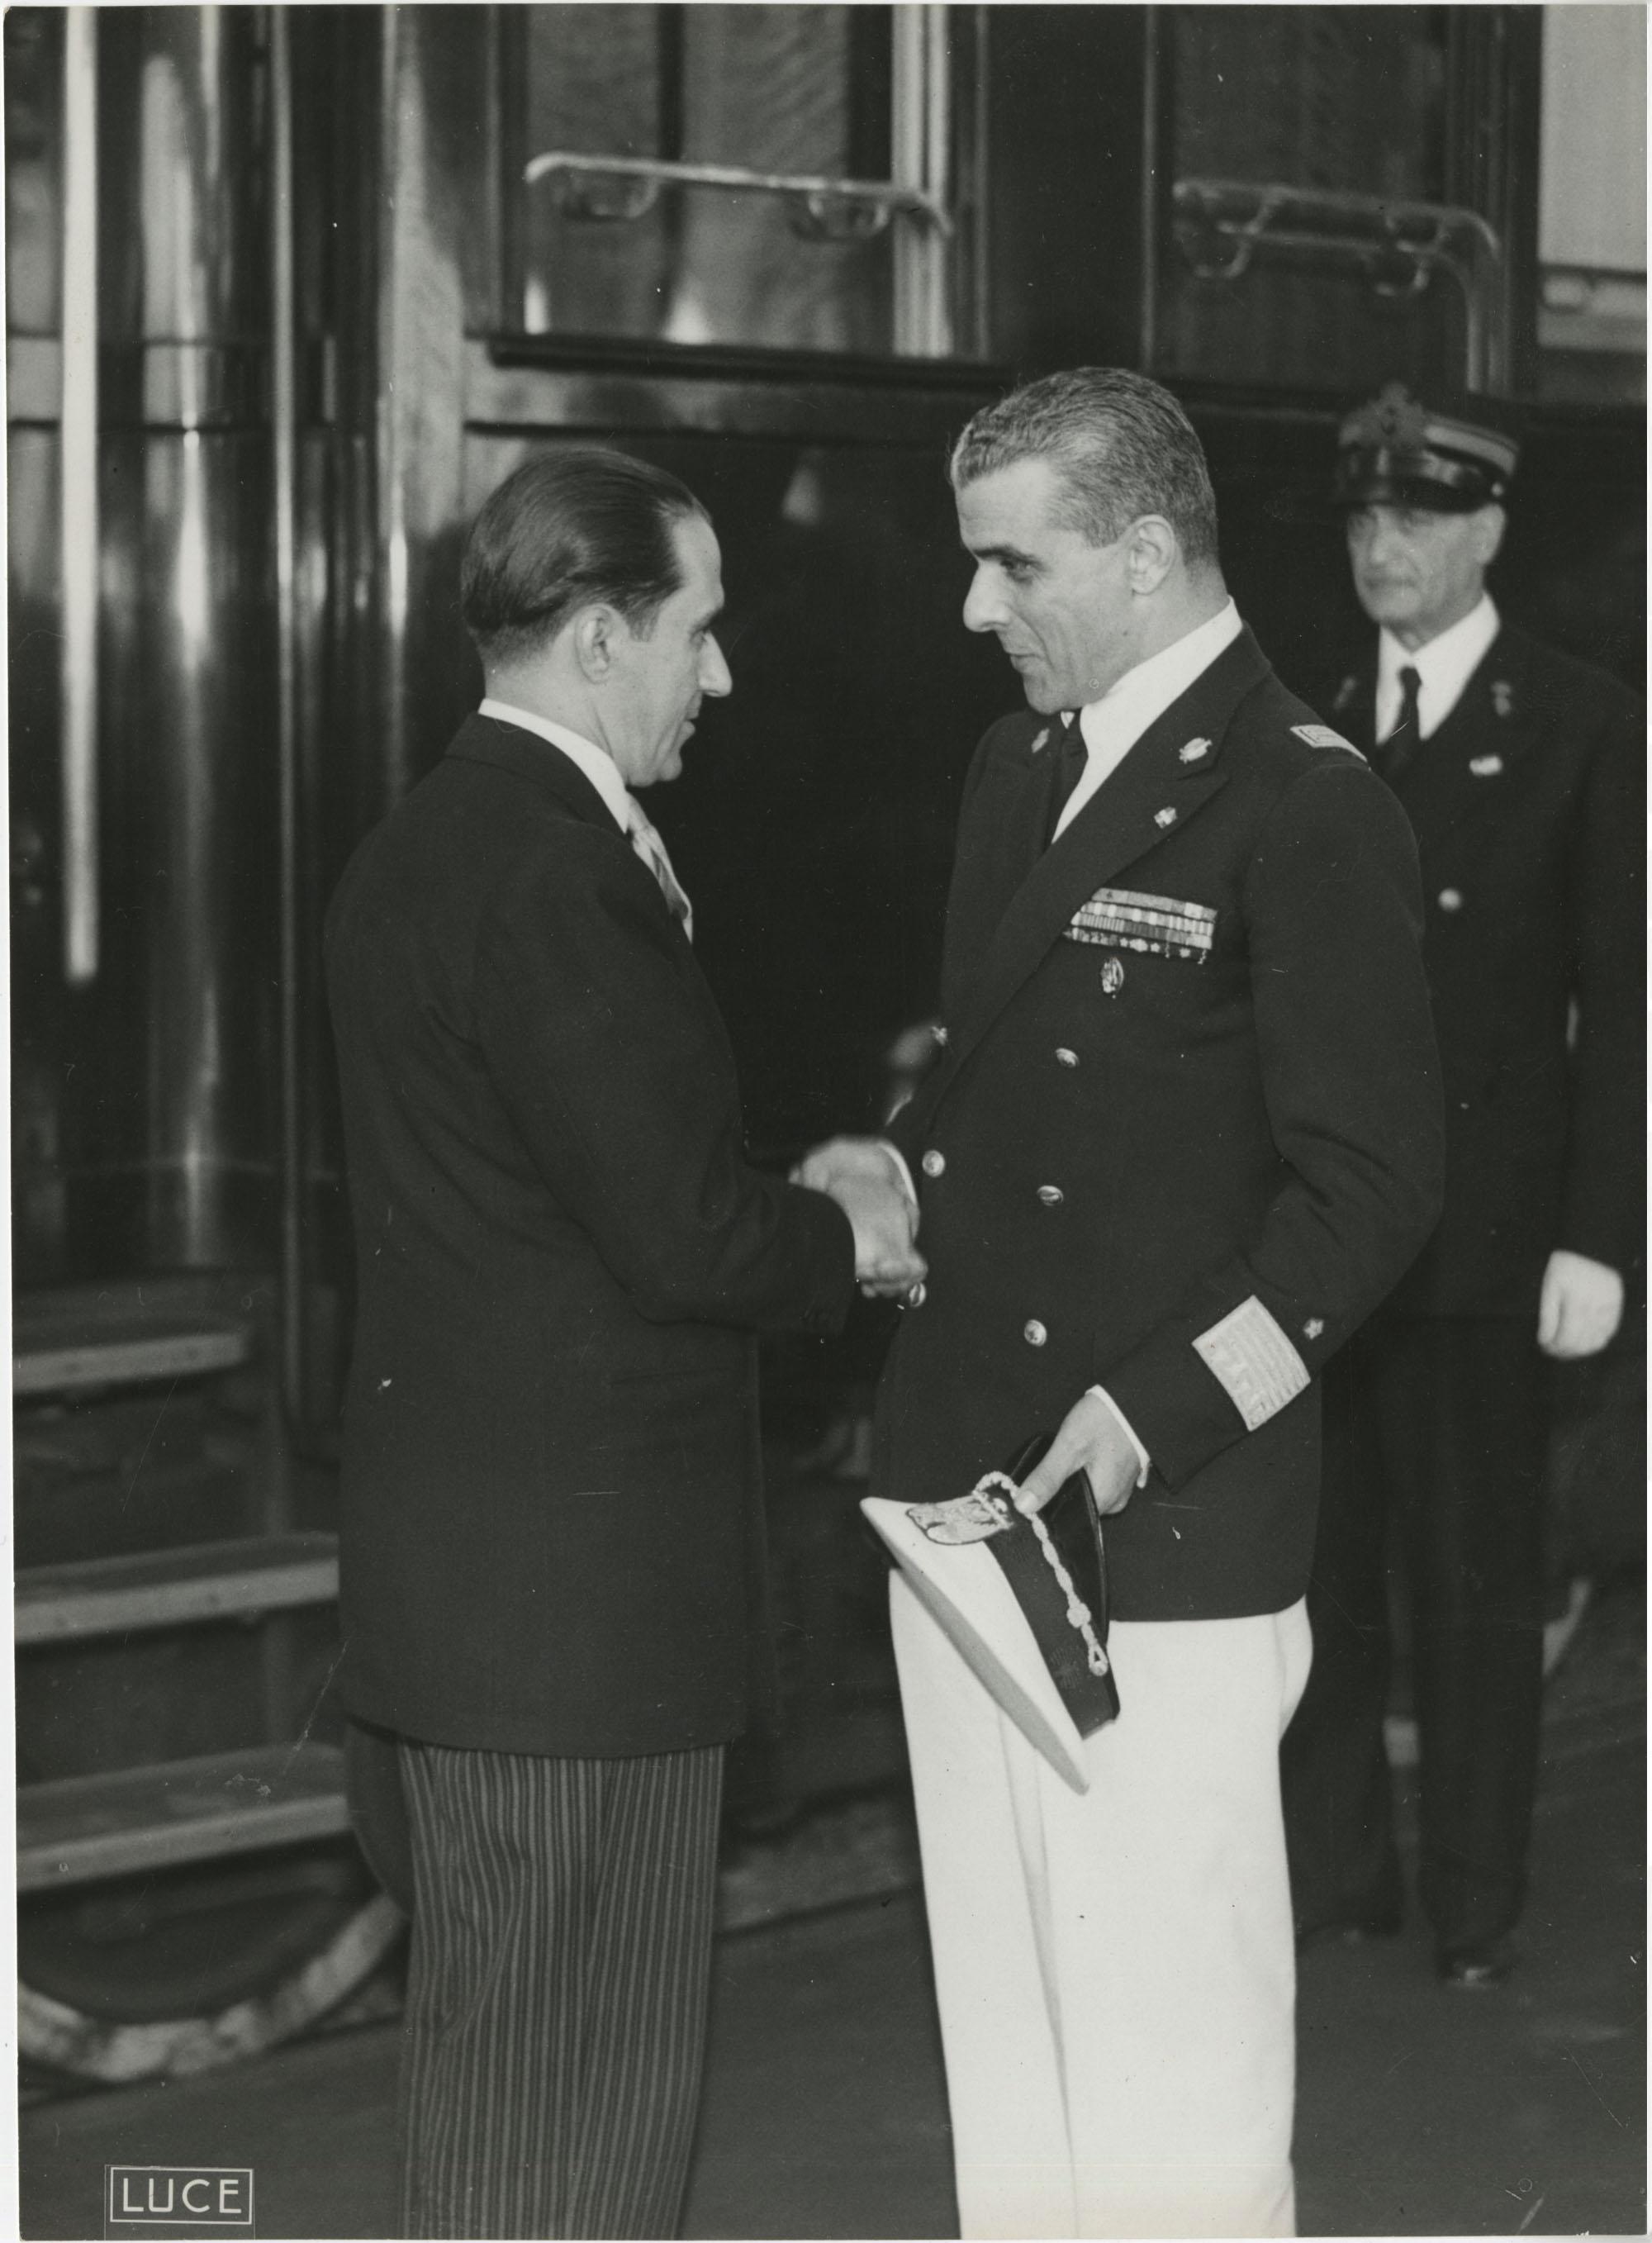 Mihai Antonescu's visit to Benito Mussolini, Photograph 42